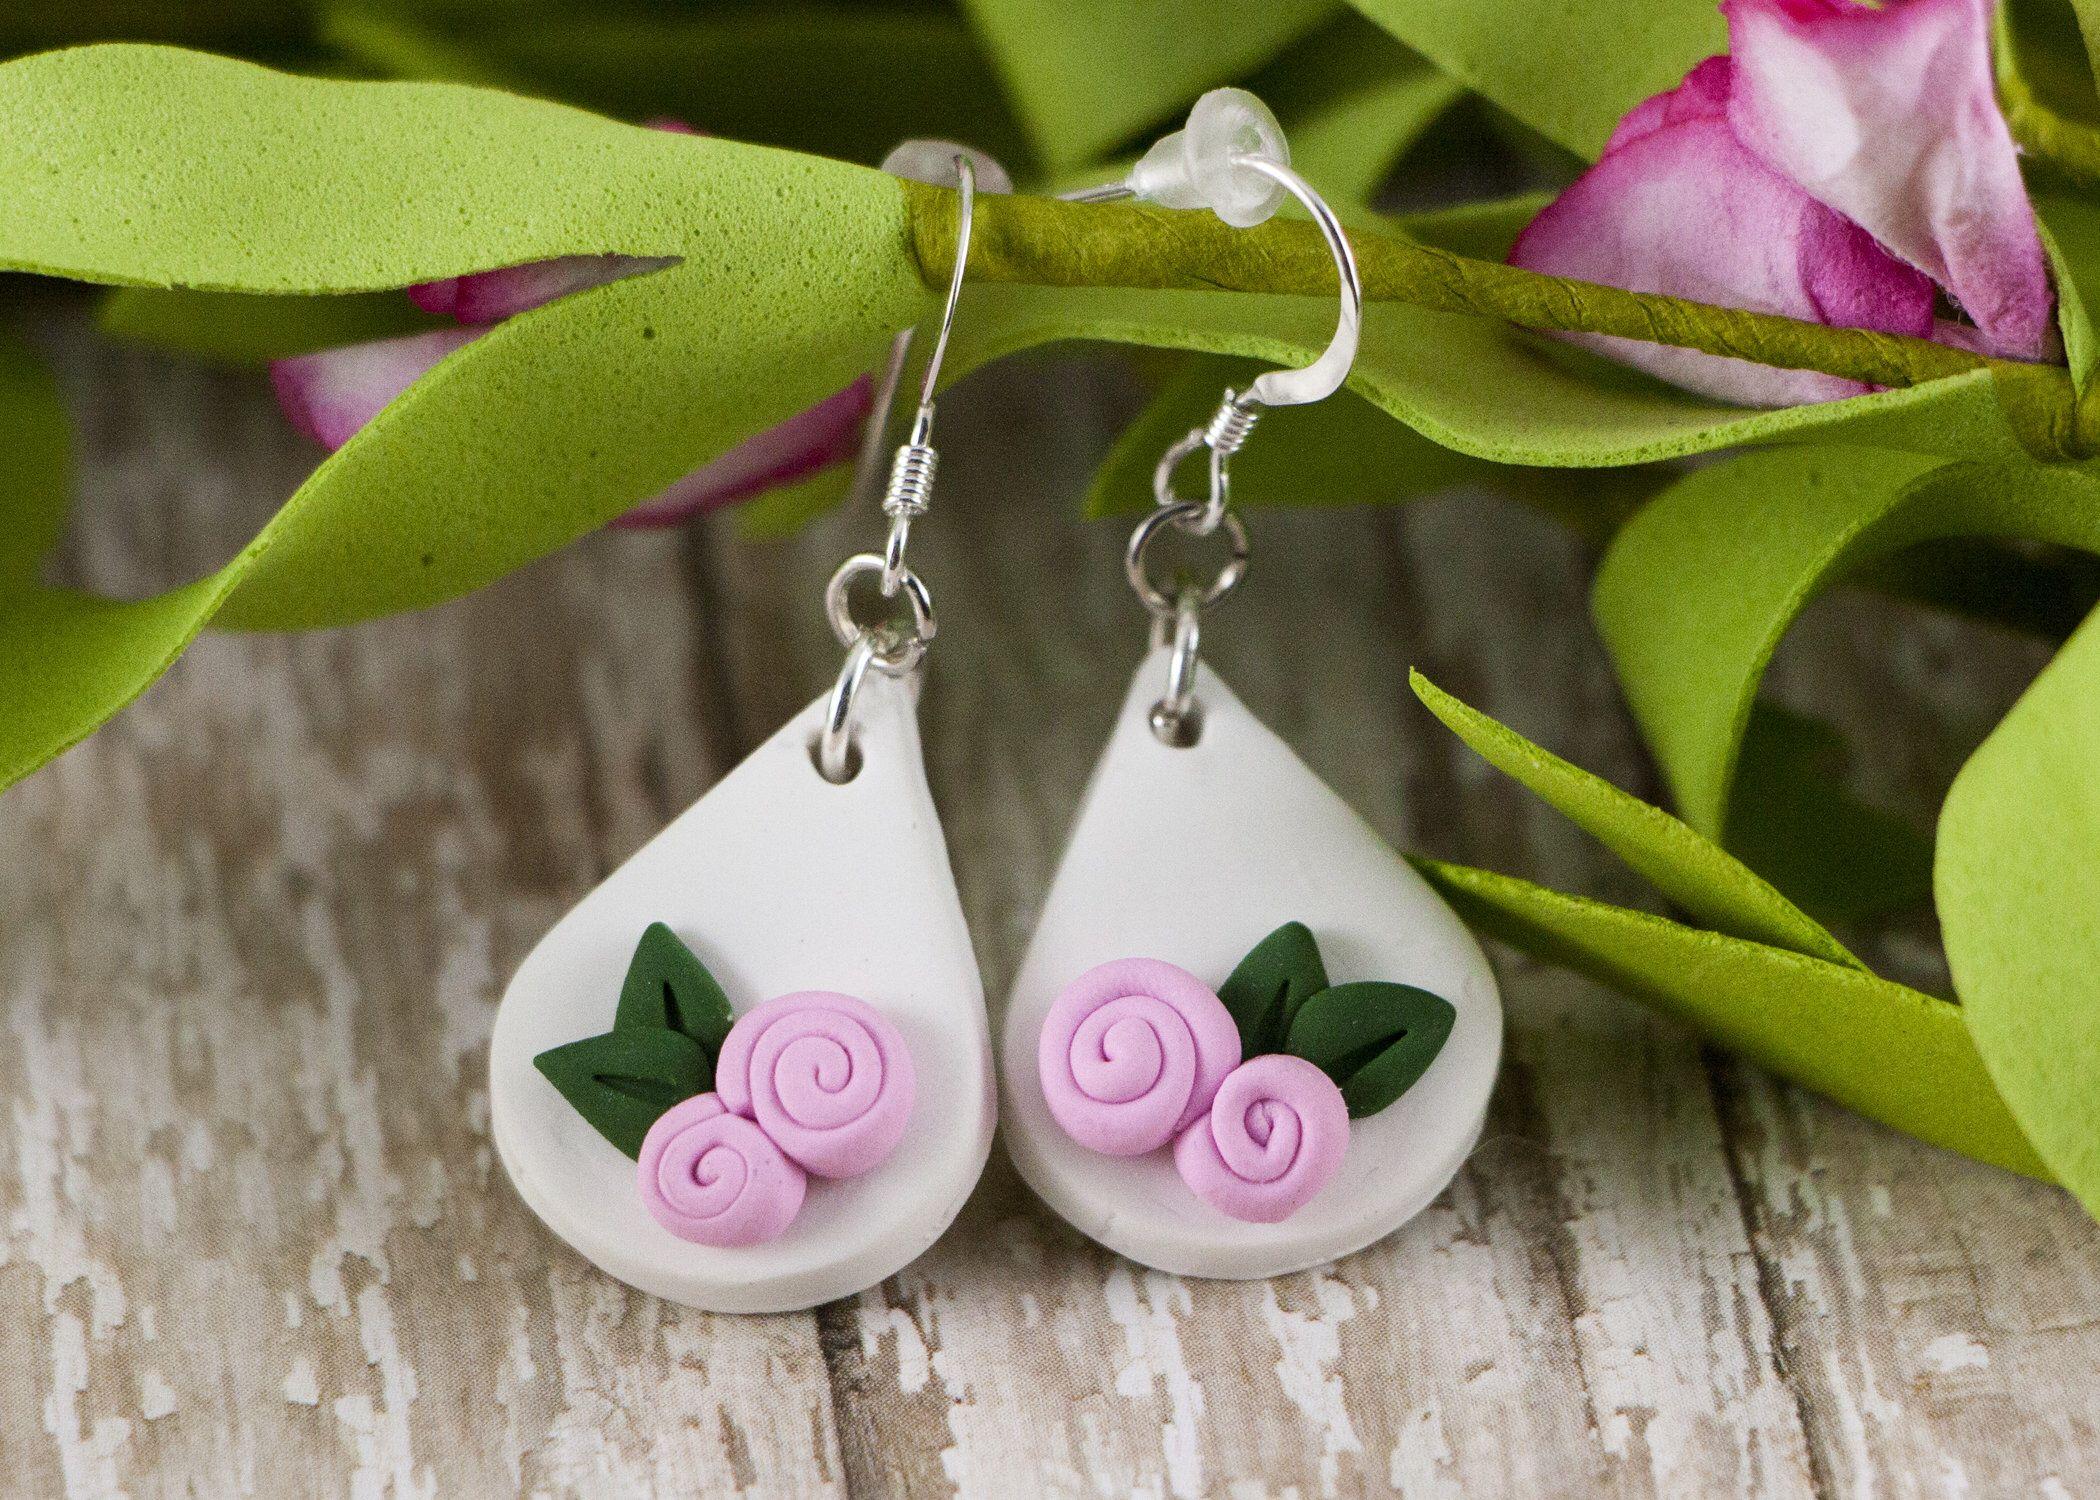 Dangle Earrings Lightweight Earrings Free Shipping Polymer Clay Earrings Spring Earrings Rose Gold Spring Jewelry Easter Jewelry